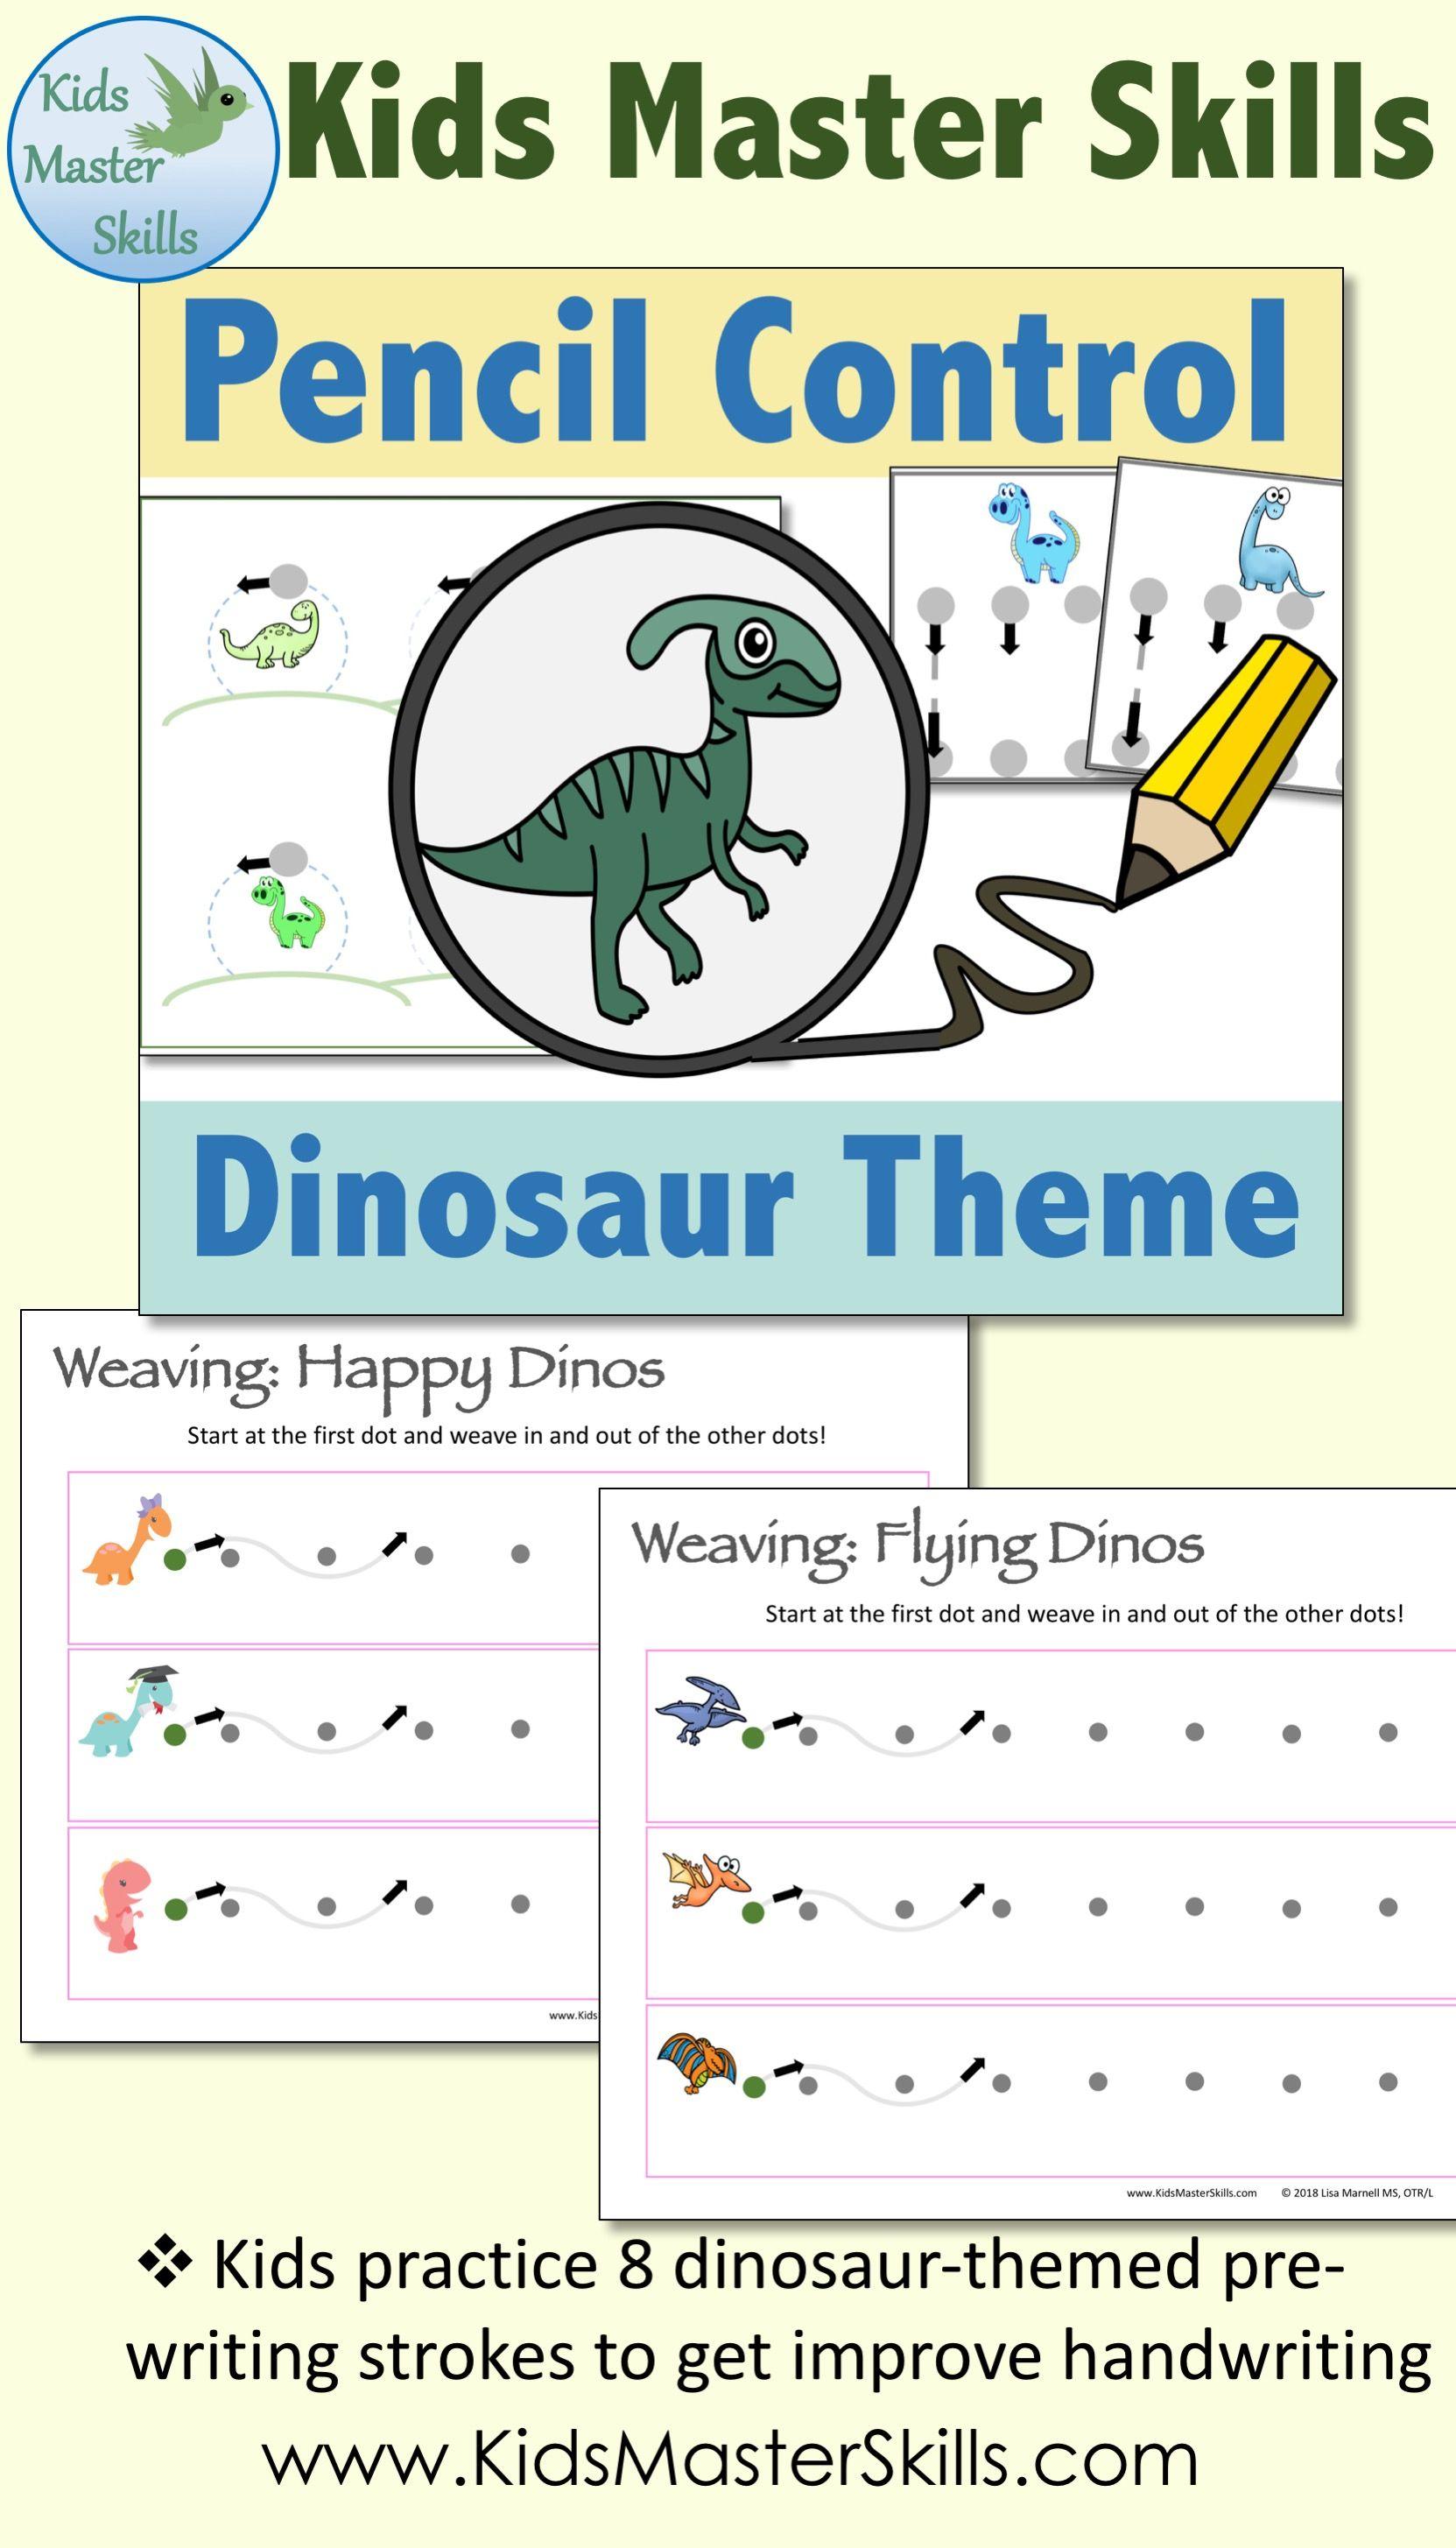 Pencil Control Dinosaurs Handwriting Strokes For Preschool And Kindergarten Pre Writing Writing Skills Teaching Handwriting Dinosaur writing activities kindergarten